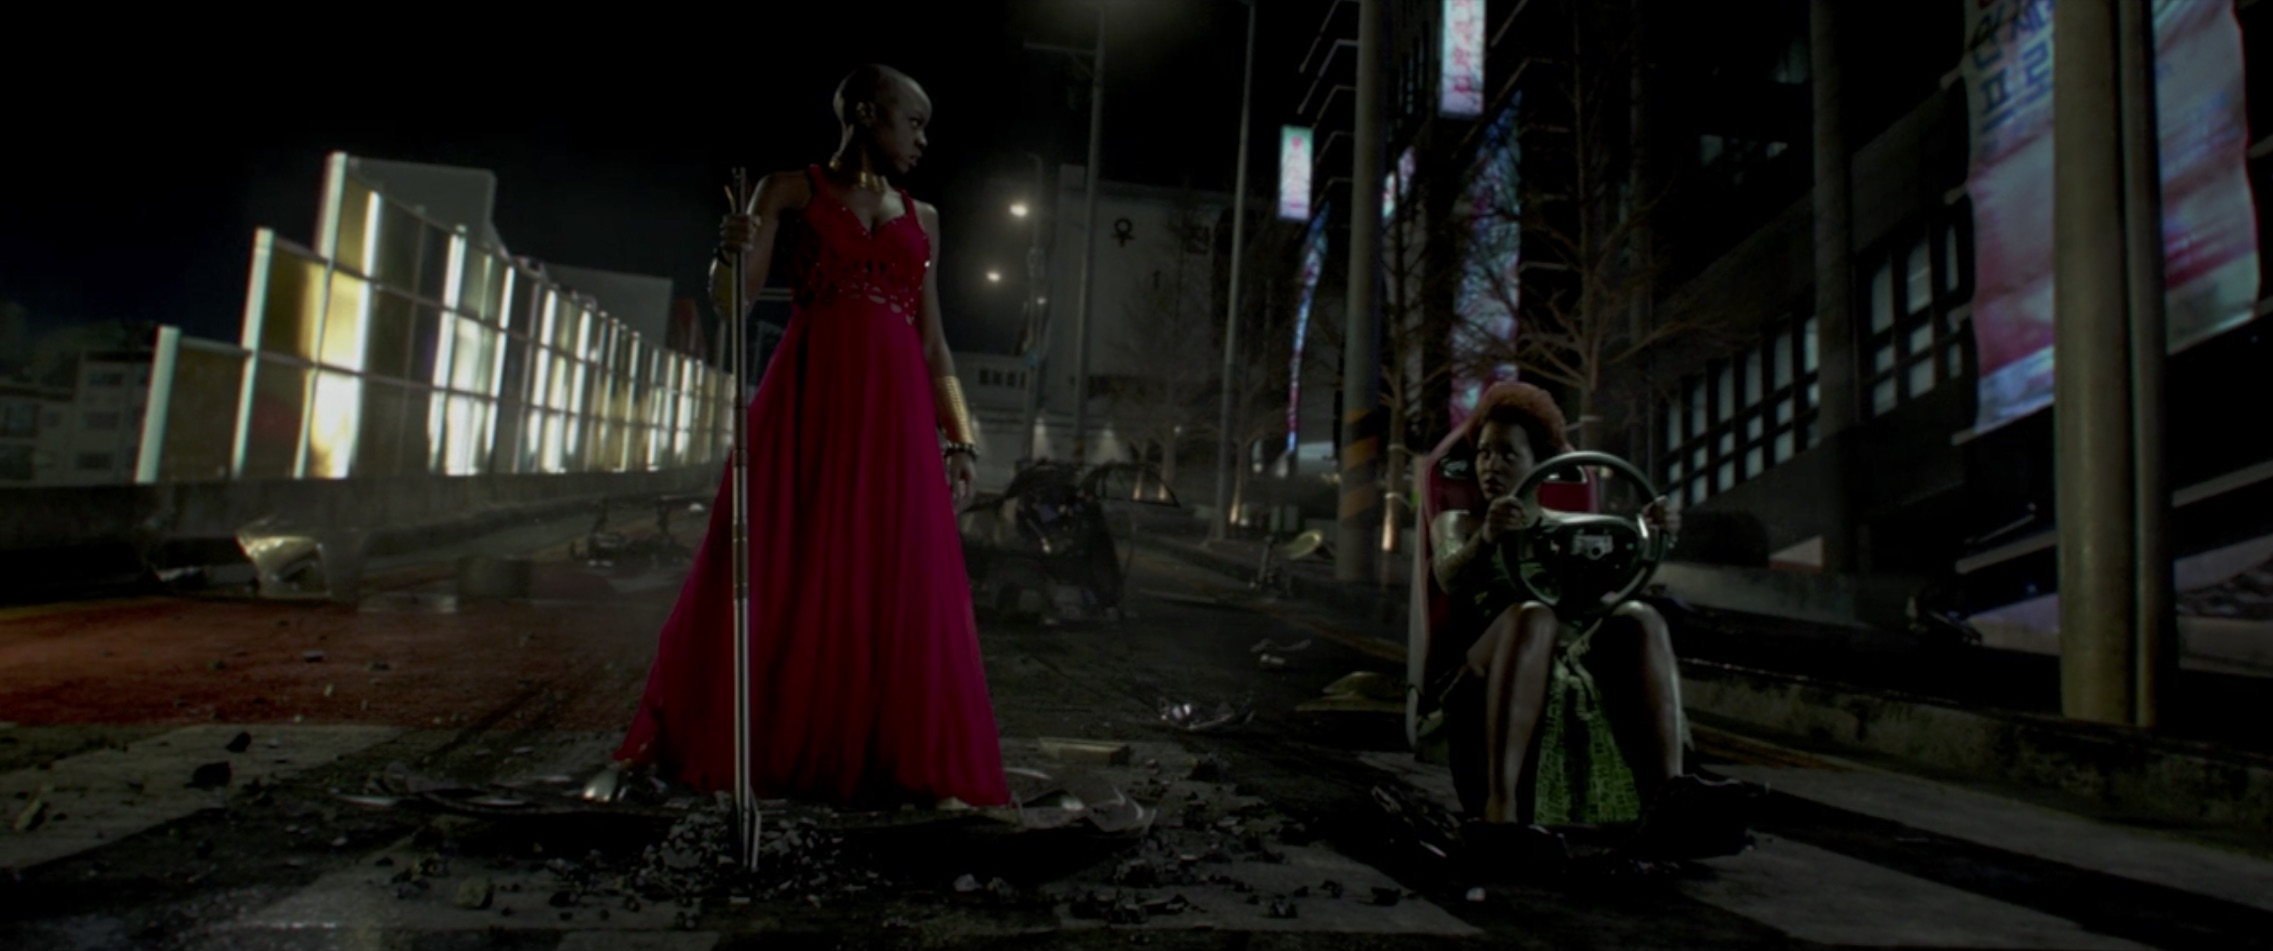 Marvel Black Panther red dress still holding wheel